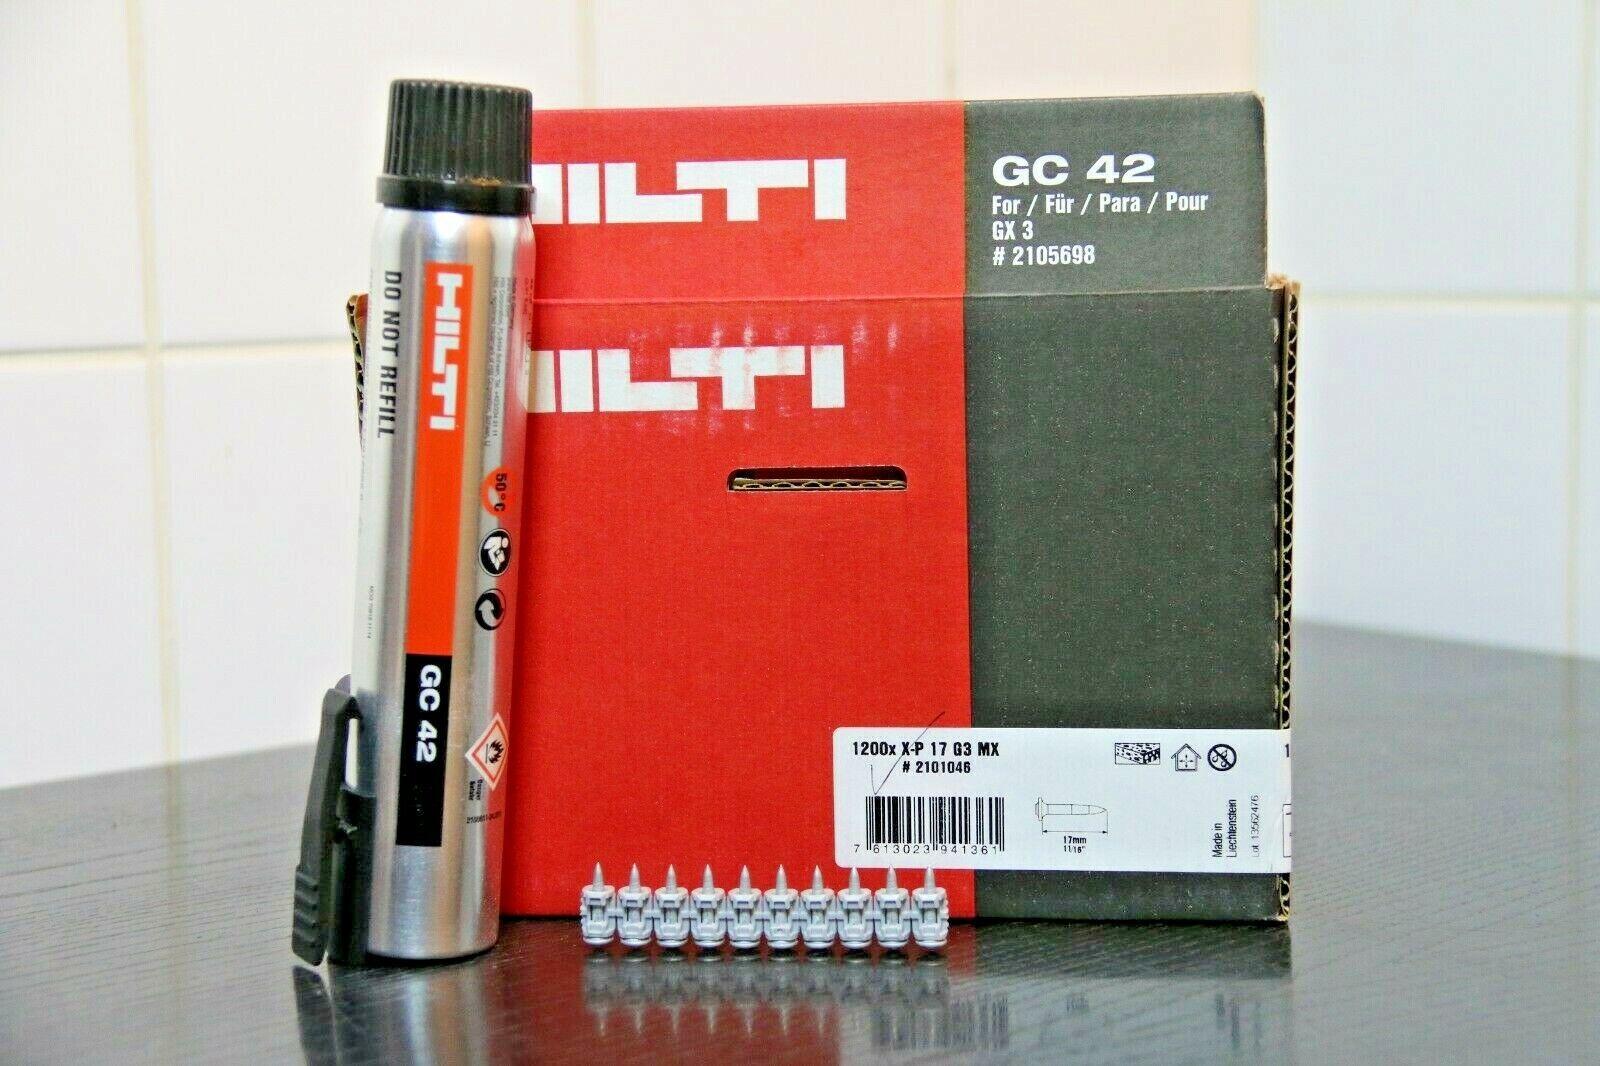 HILTI GX3 GX 3 1200  UNIVERSAL NAGEL Nägel X-P 17 G3 MX 17mm + GC 42 Gas Beton